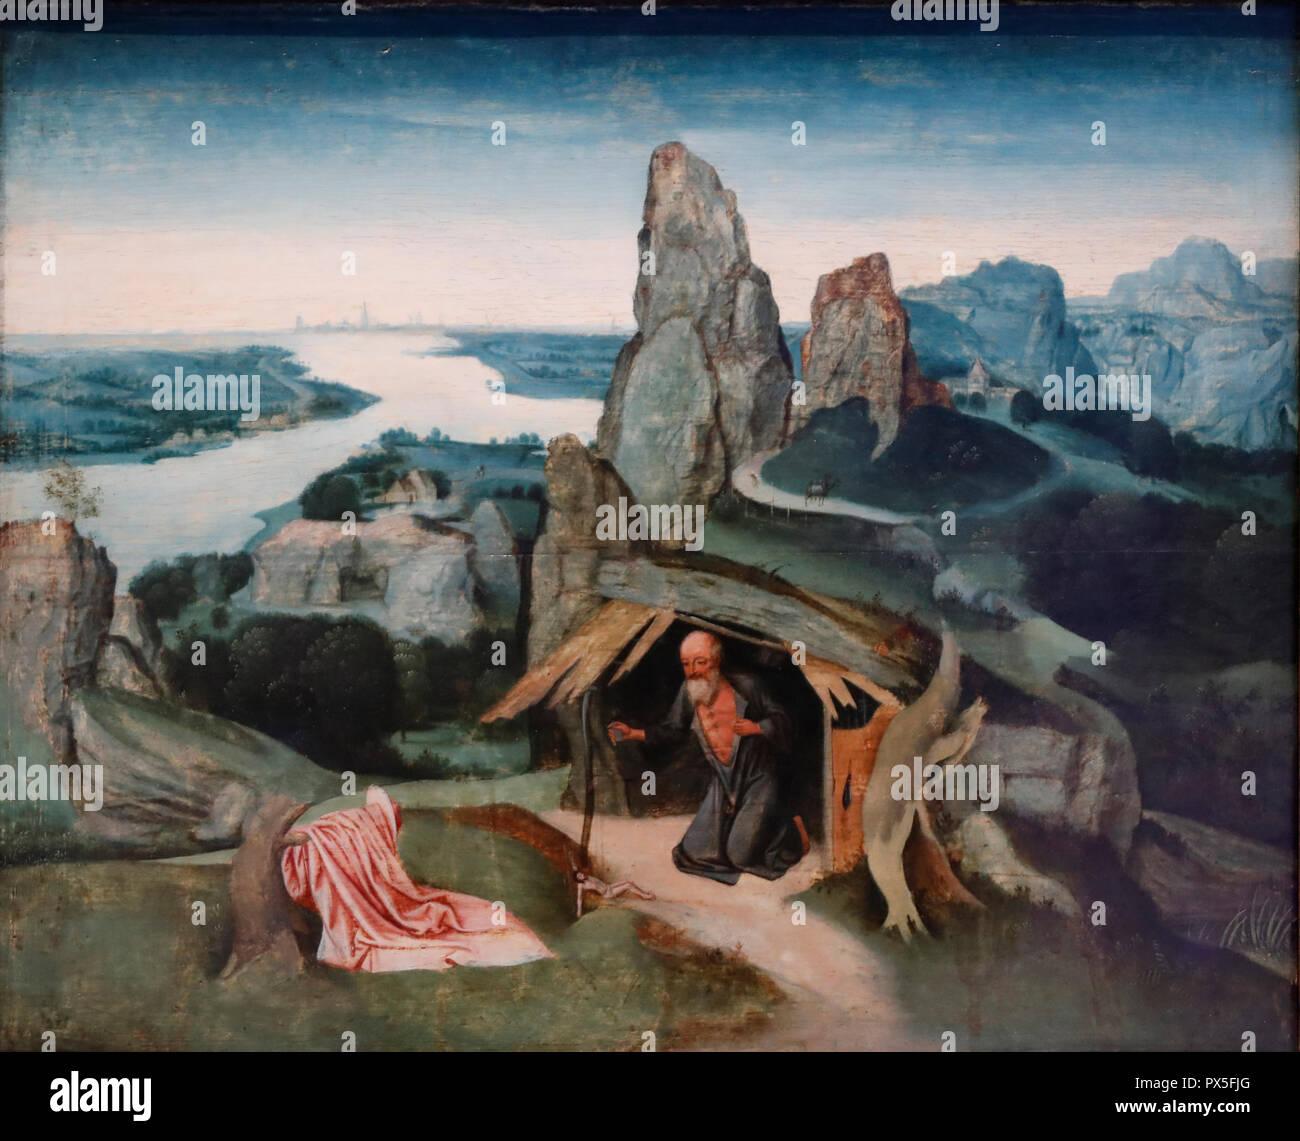 Museum of Art and History. Saint Jerome dans un paysage. (Saint Jerome in the Wilderness). 1530. Joachim Patinir.  Geneva. Switzerland. Stock Photo